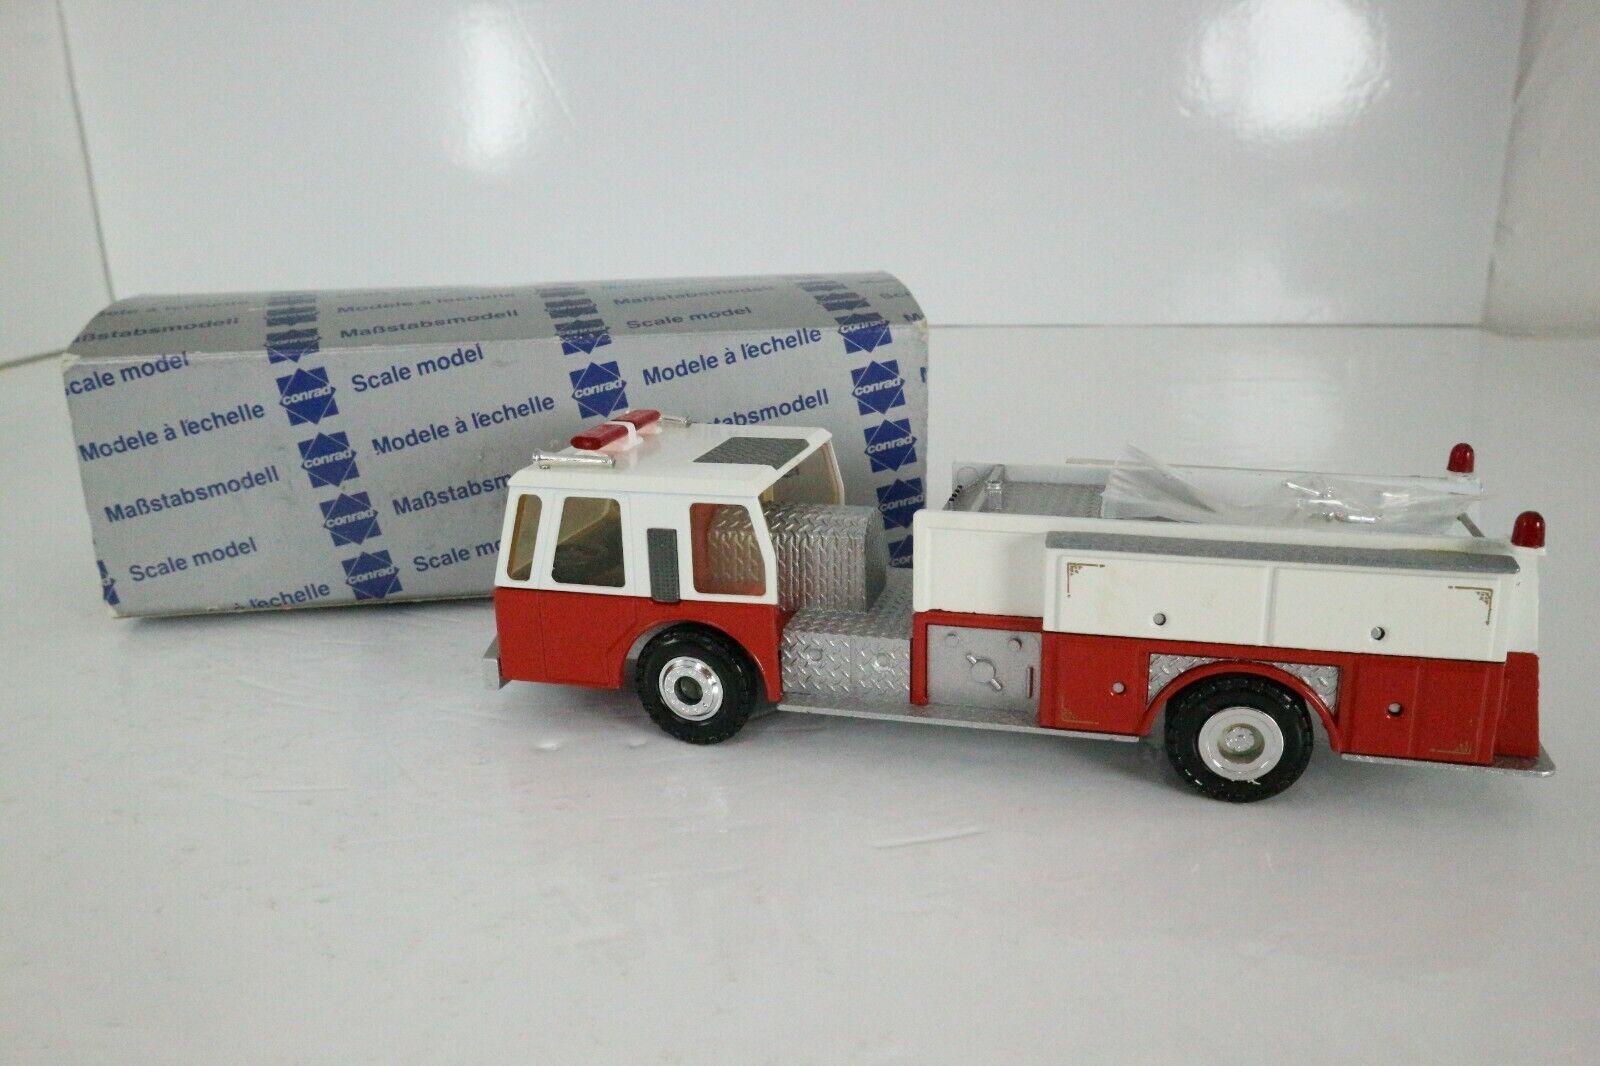 CONRAD DIE CAST 1 50 5508 EMERGENCY PUMPER FIRE TRUCK METAL